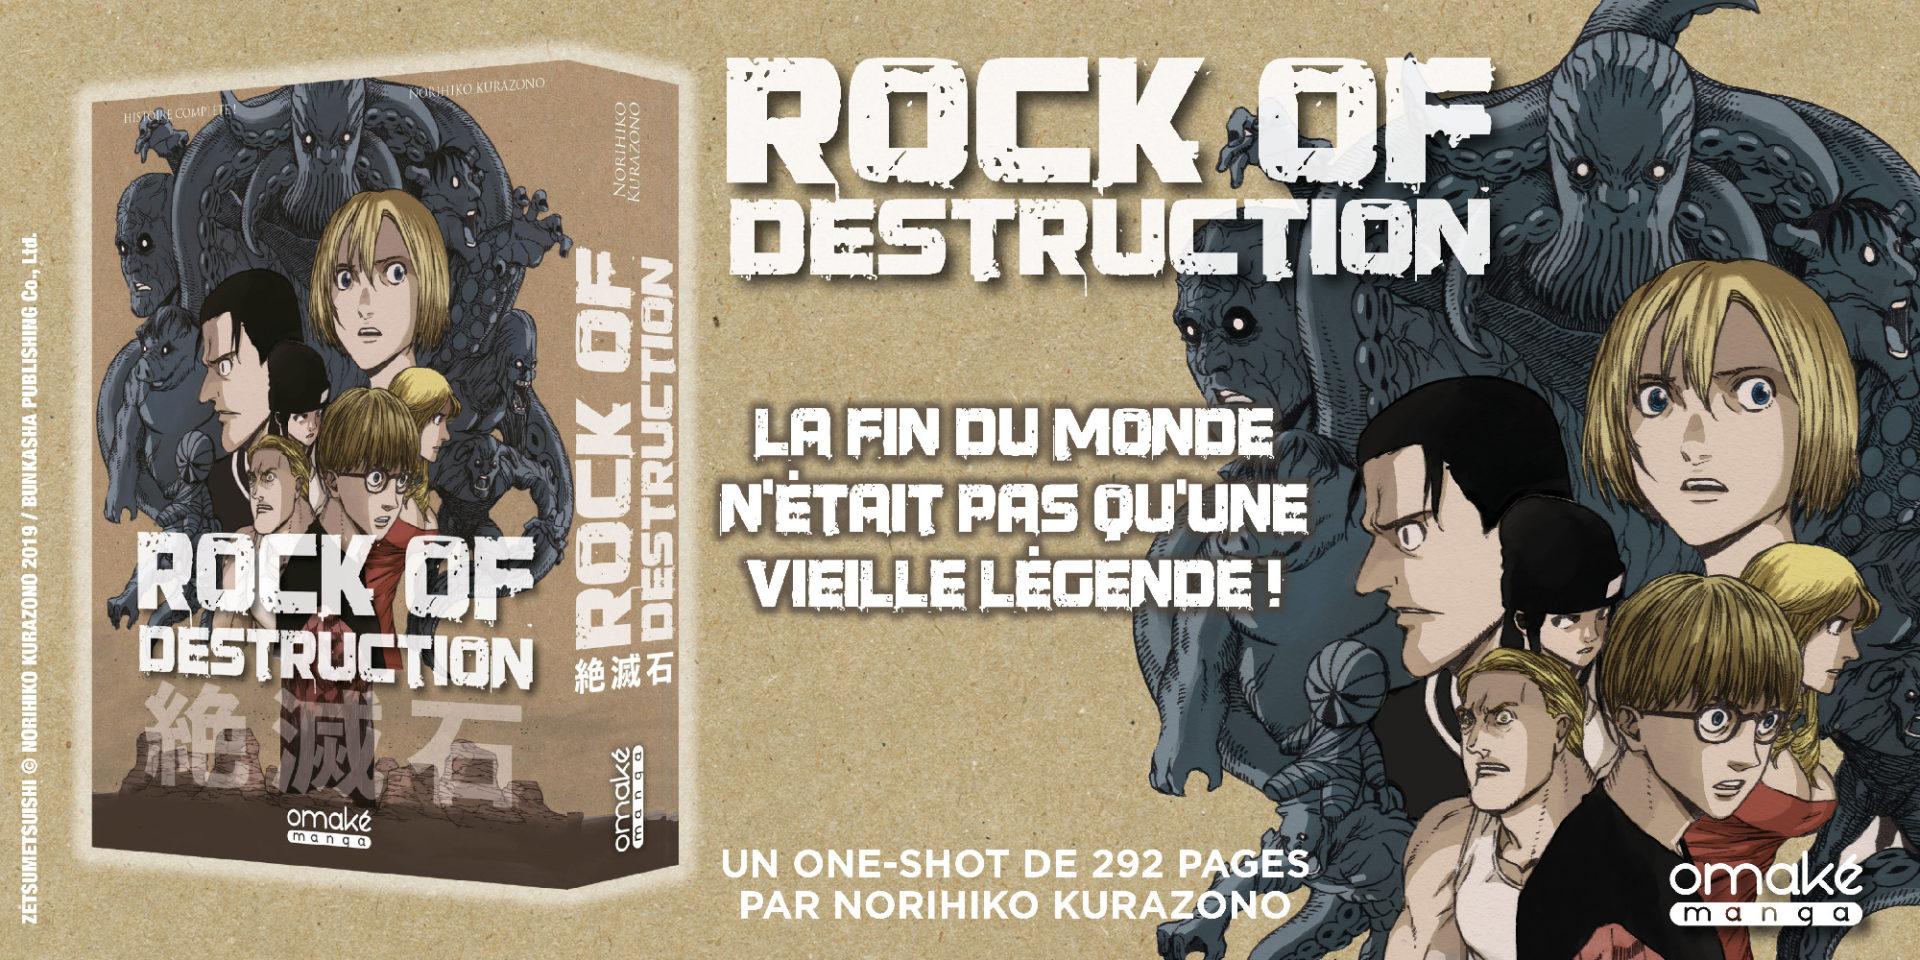 Rock of Destruction - news